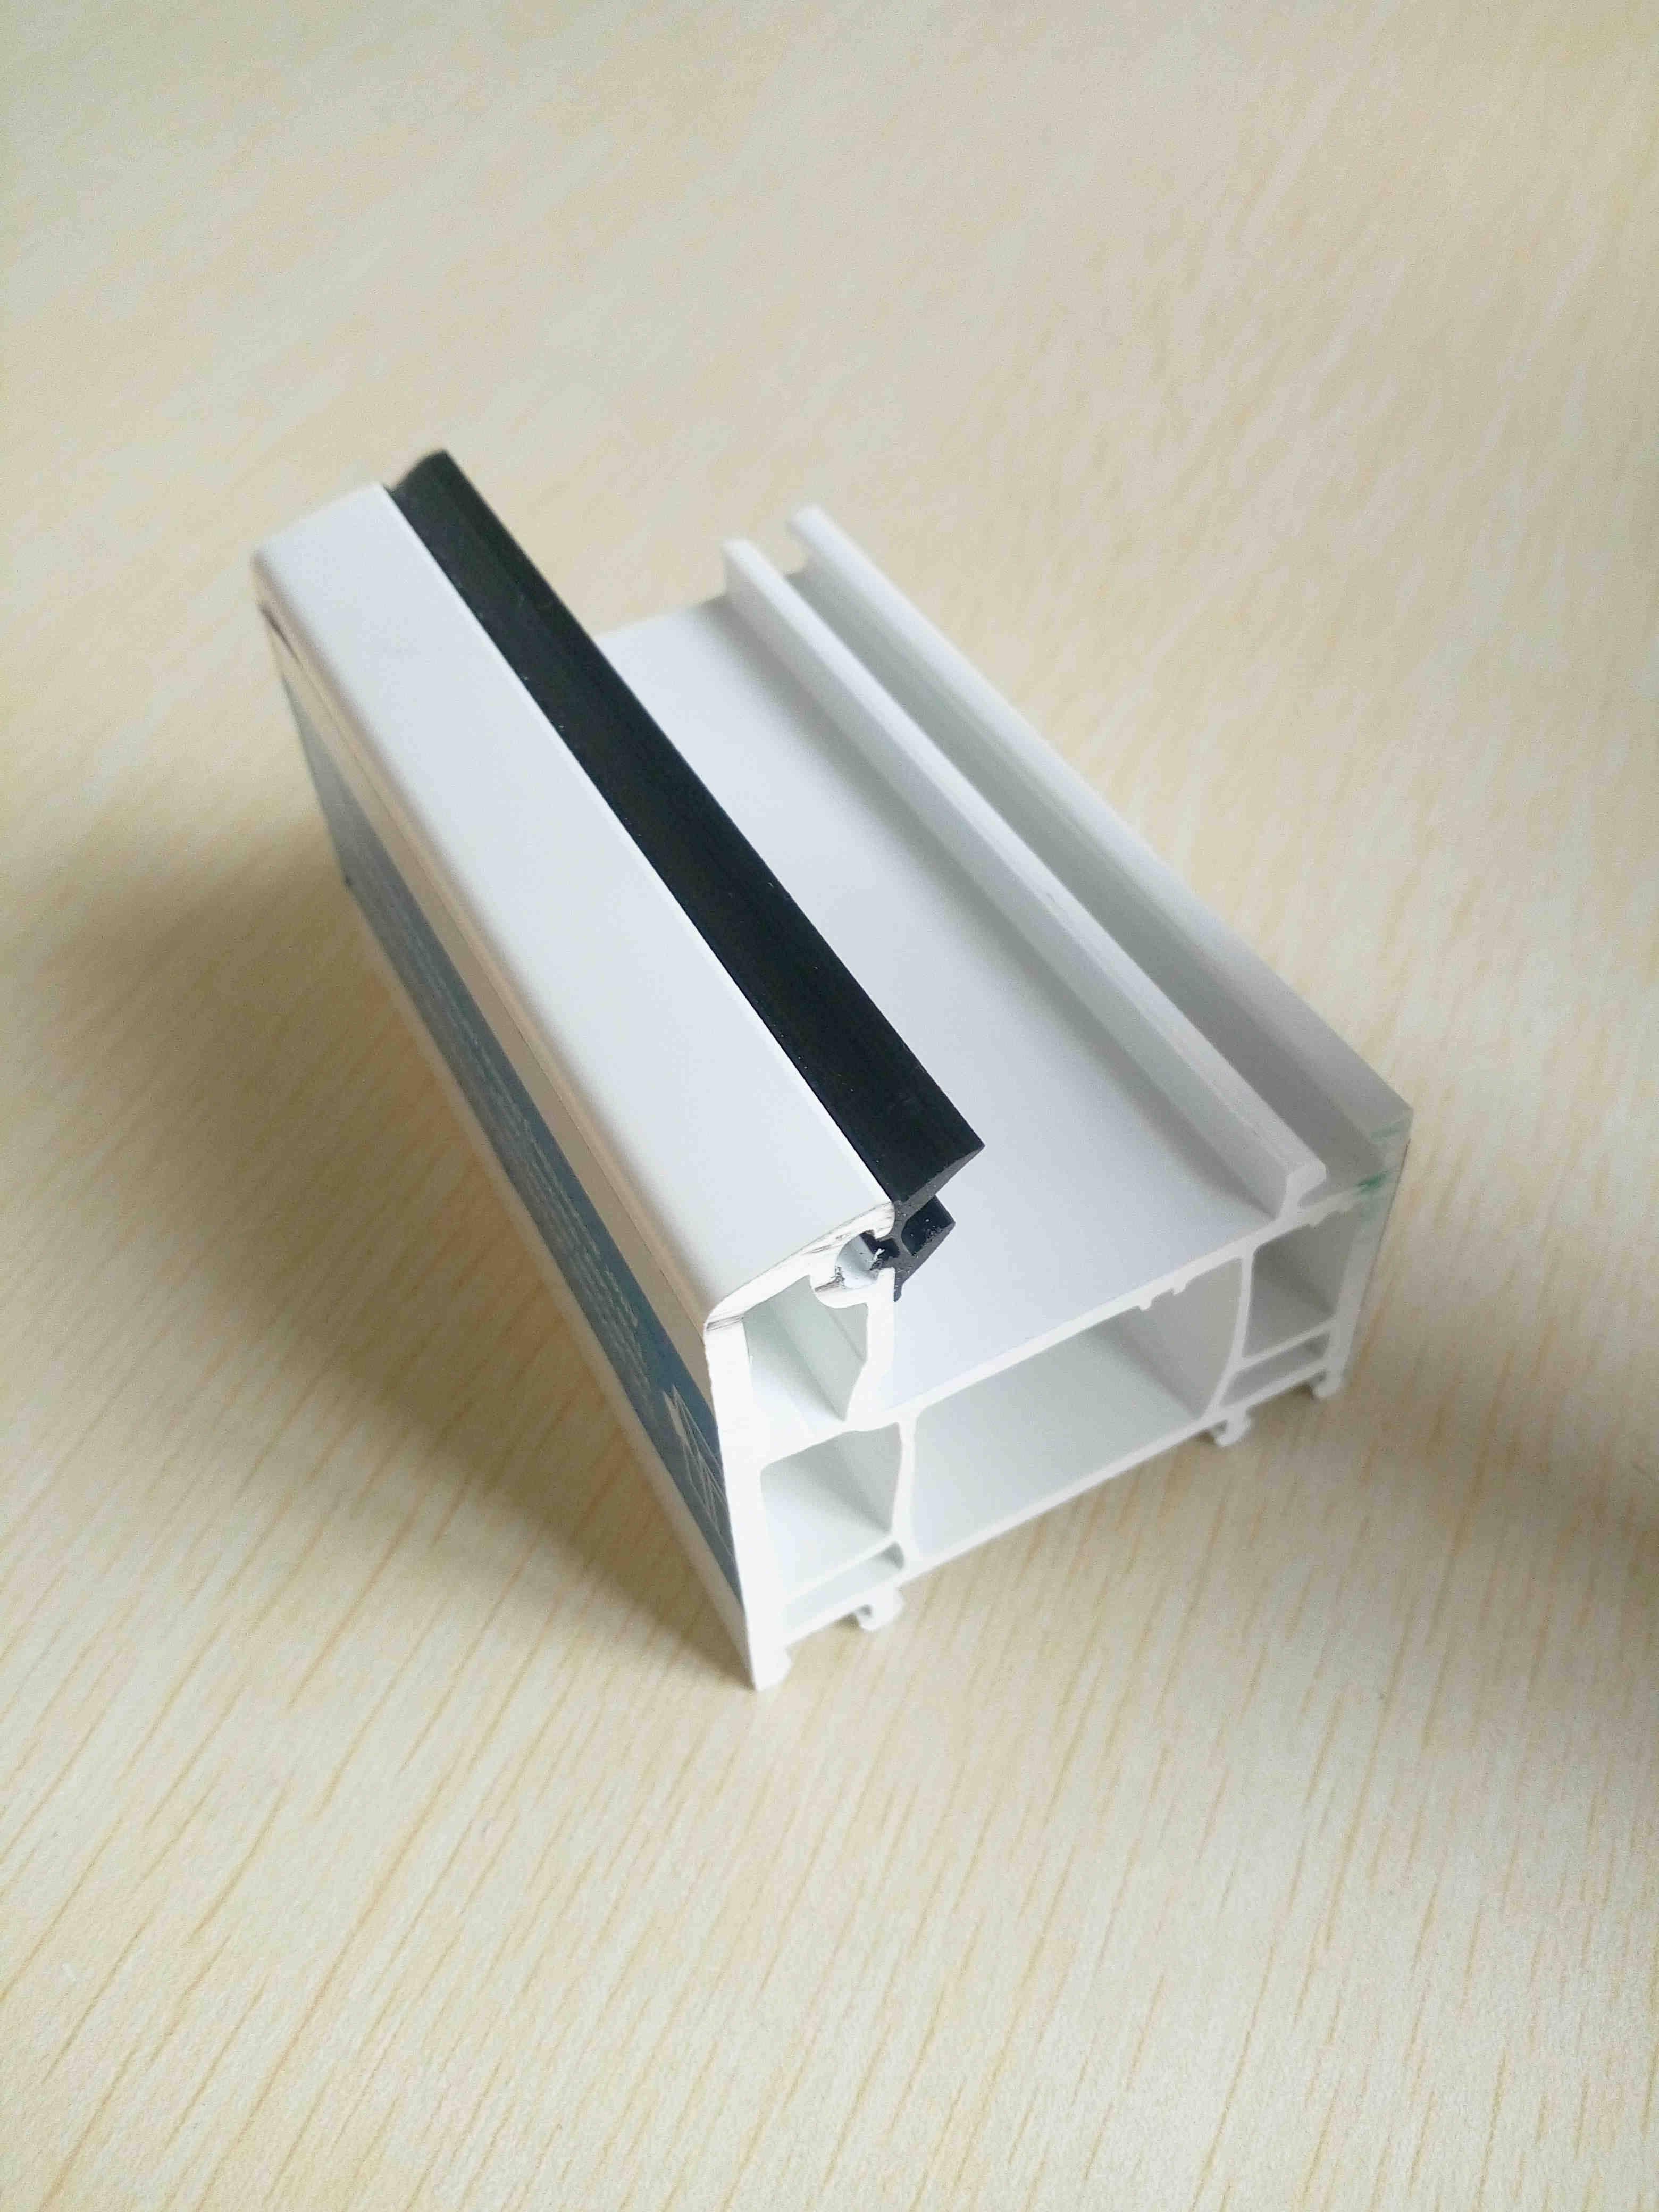 60mm white casement window plastic pvc profile for window and door